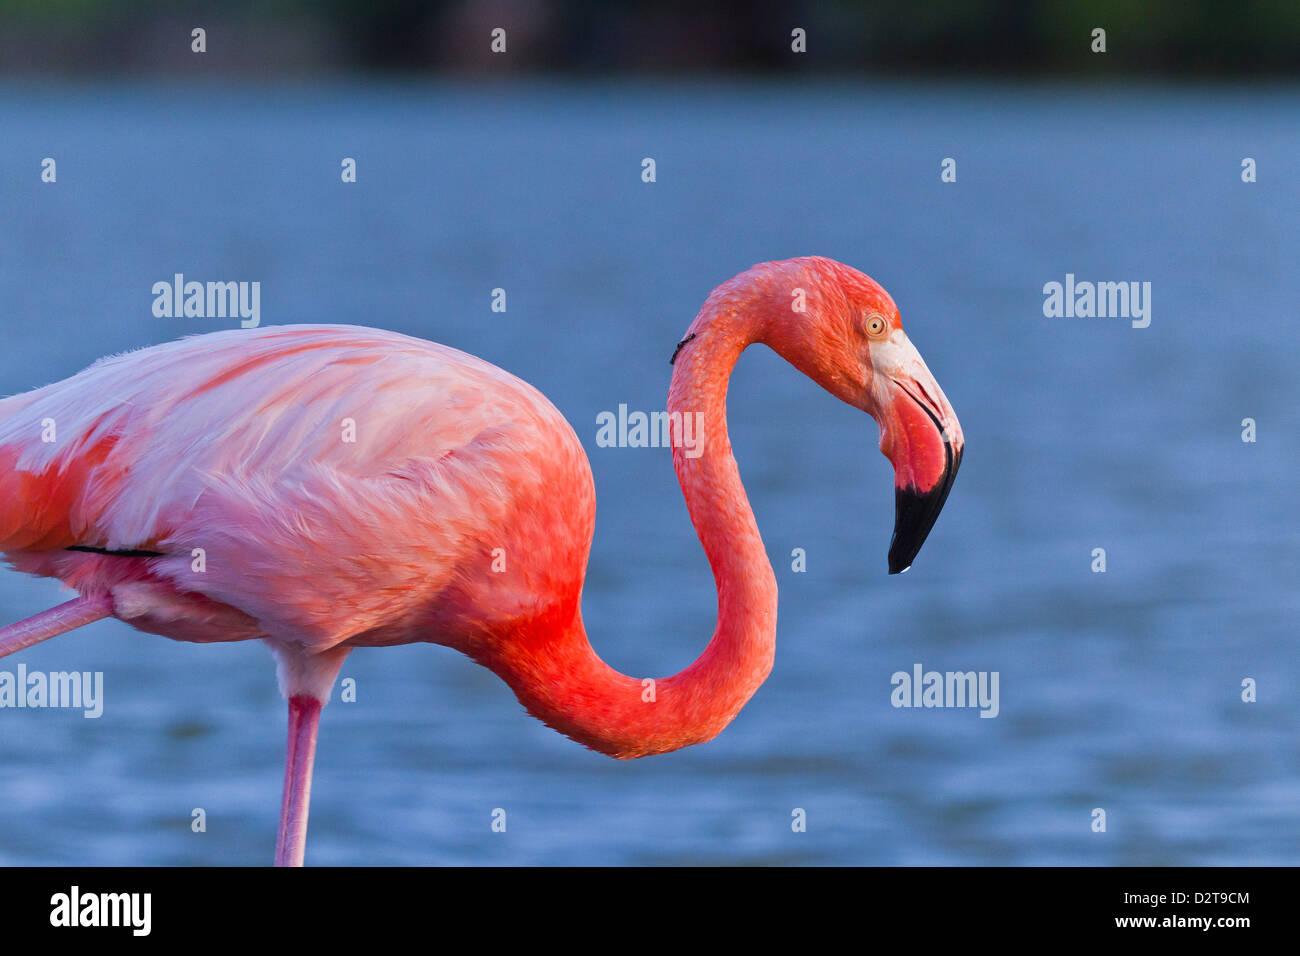 Greater flamingo (Phoenicopterus ruber), Las Bachas, Santa Cruz Island, Galapagos Islands, Ecuador, South America - Stock Image